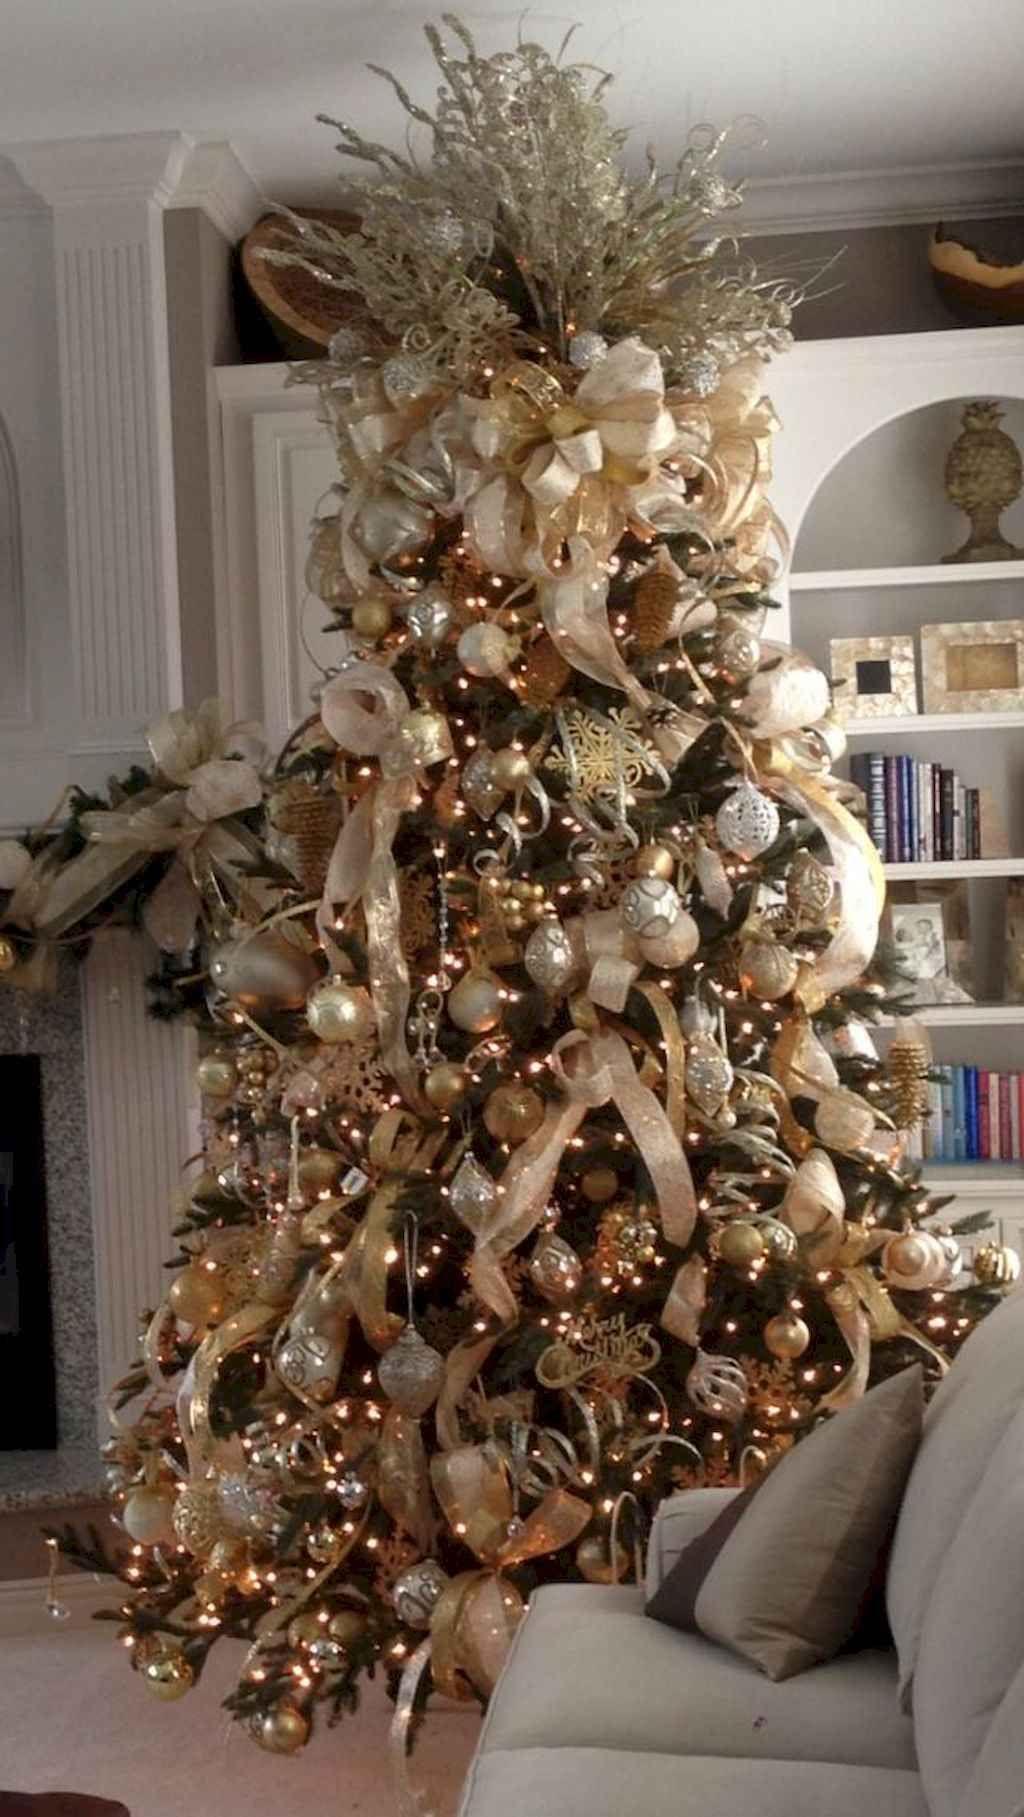 Cool 65 Diy Christmas Tree Decorating Ideas Source Link Https Decortutor Com 2846 65 Elegant Christmas Trees Gold Christmas Tree Christmas Tree Decorations